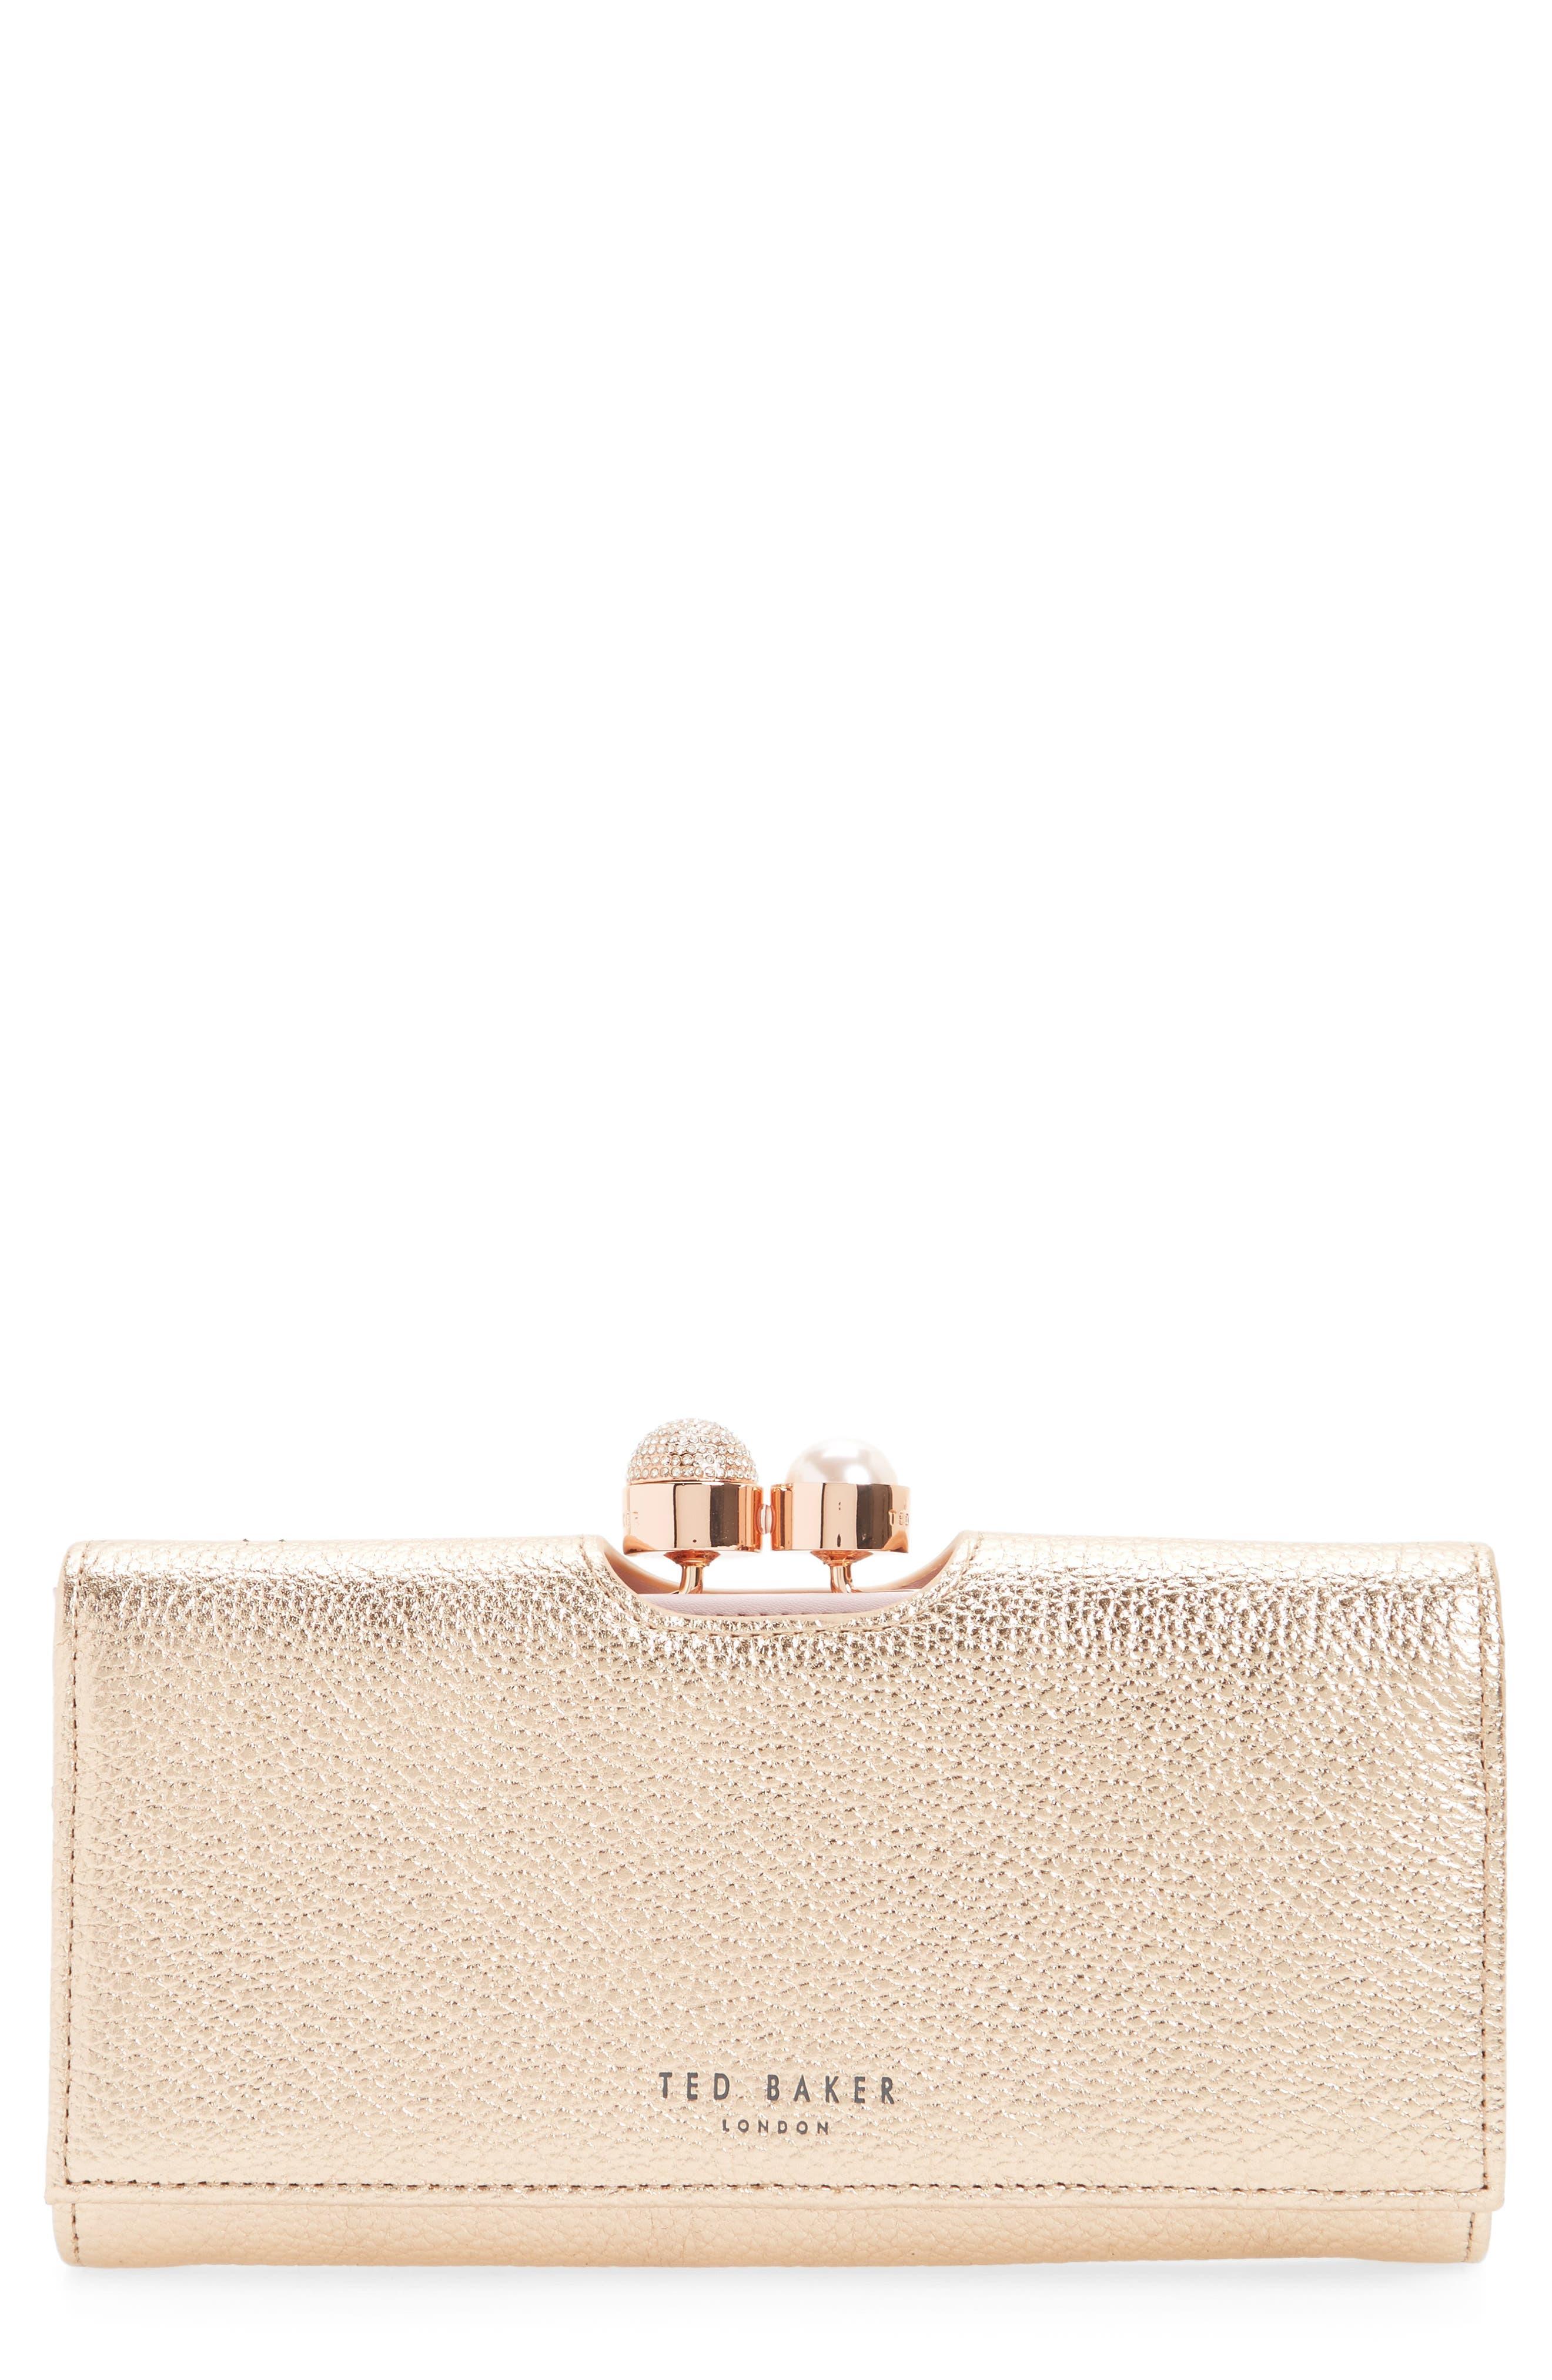 Marta Bobble Matinée Leather Wallet,                             Main thumbnail 1, color,                             Rose Gold